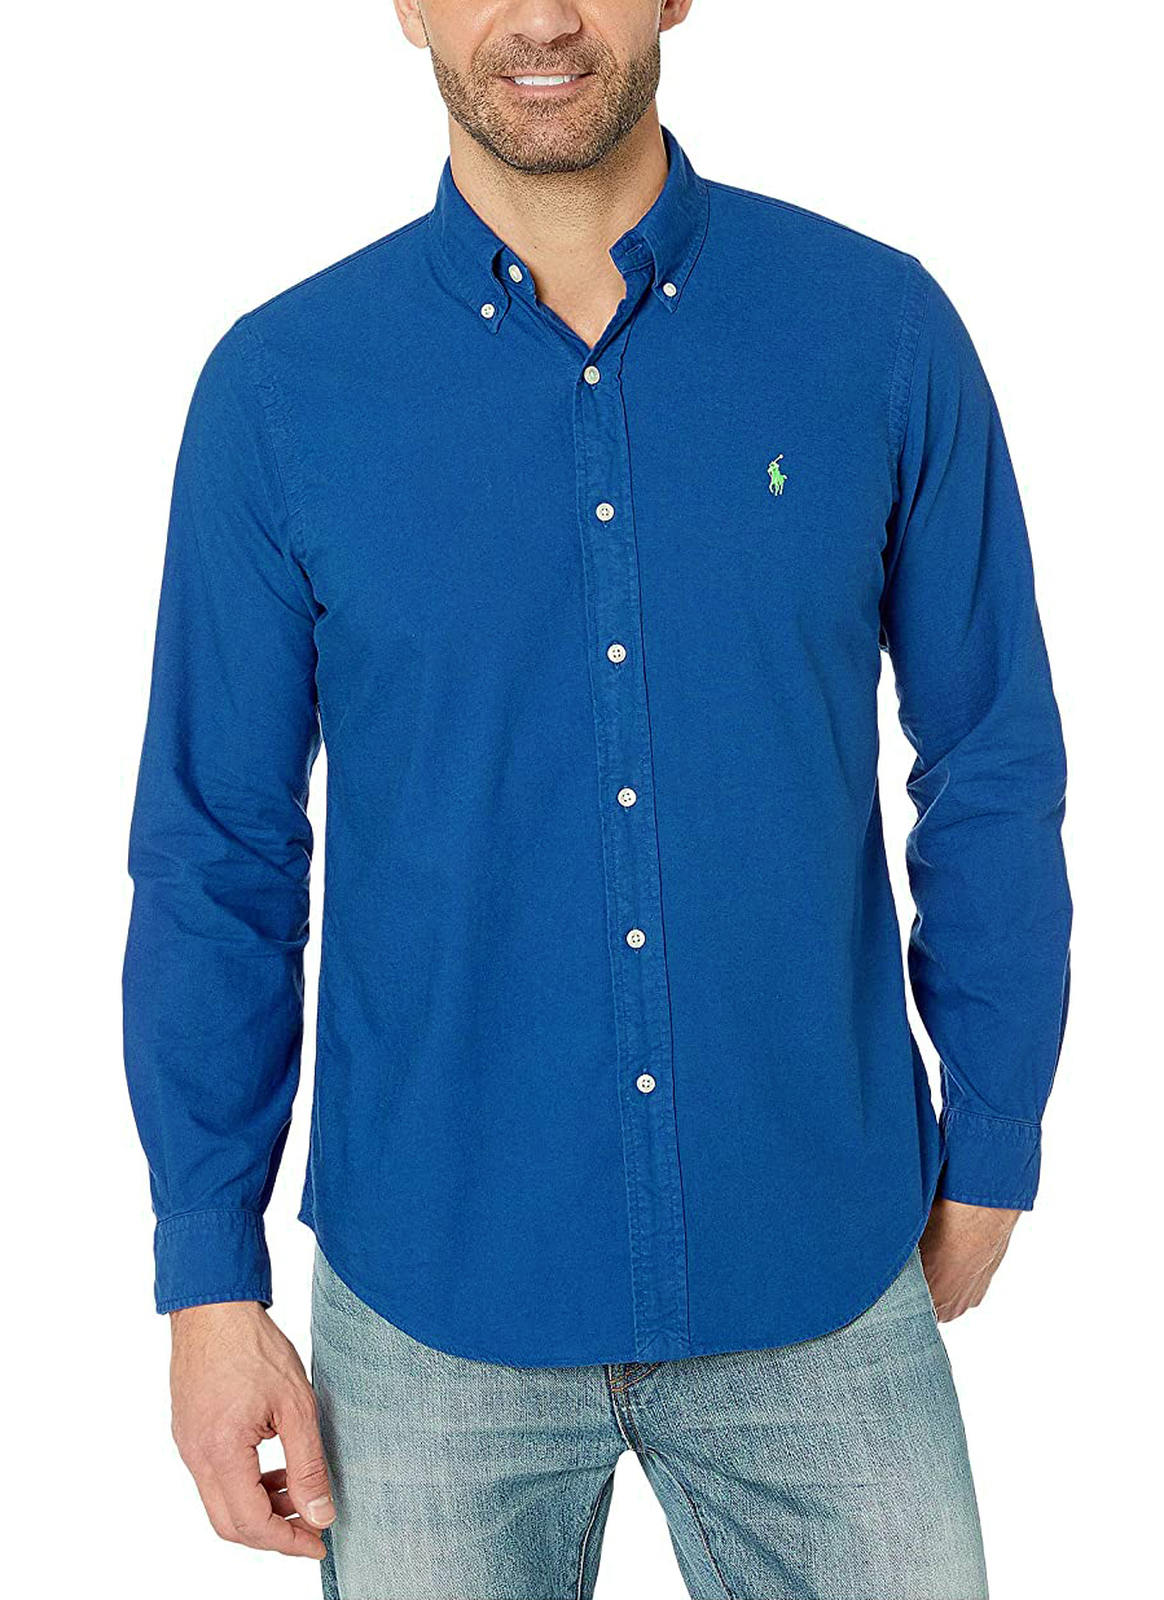 Camisa Ralph Lauren Masculina Custom Fit Cotton Basic Azul Royal